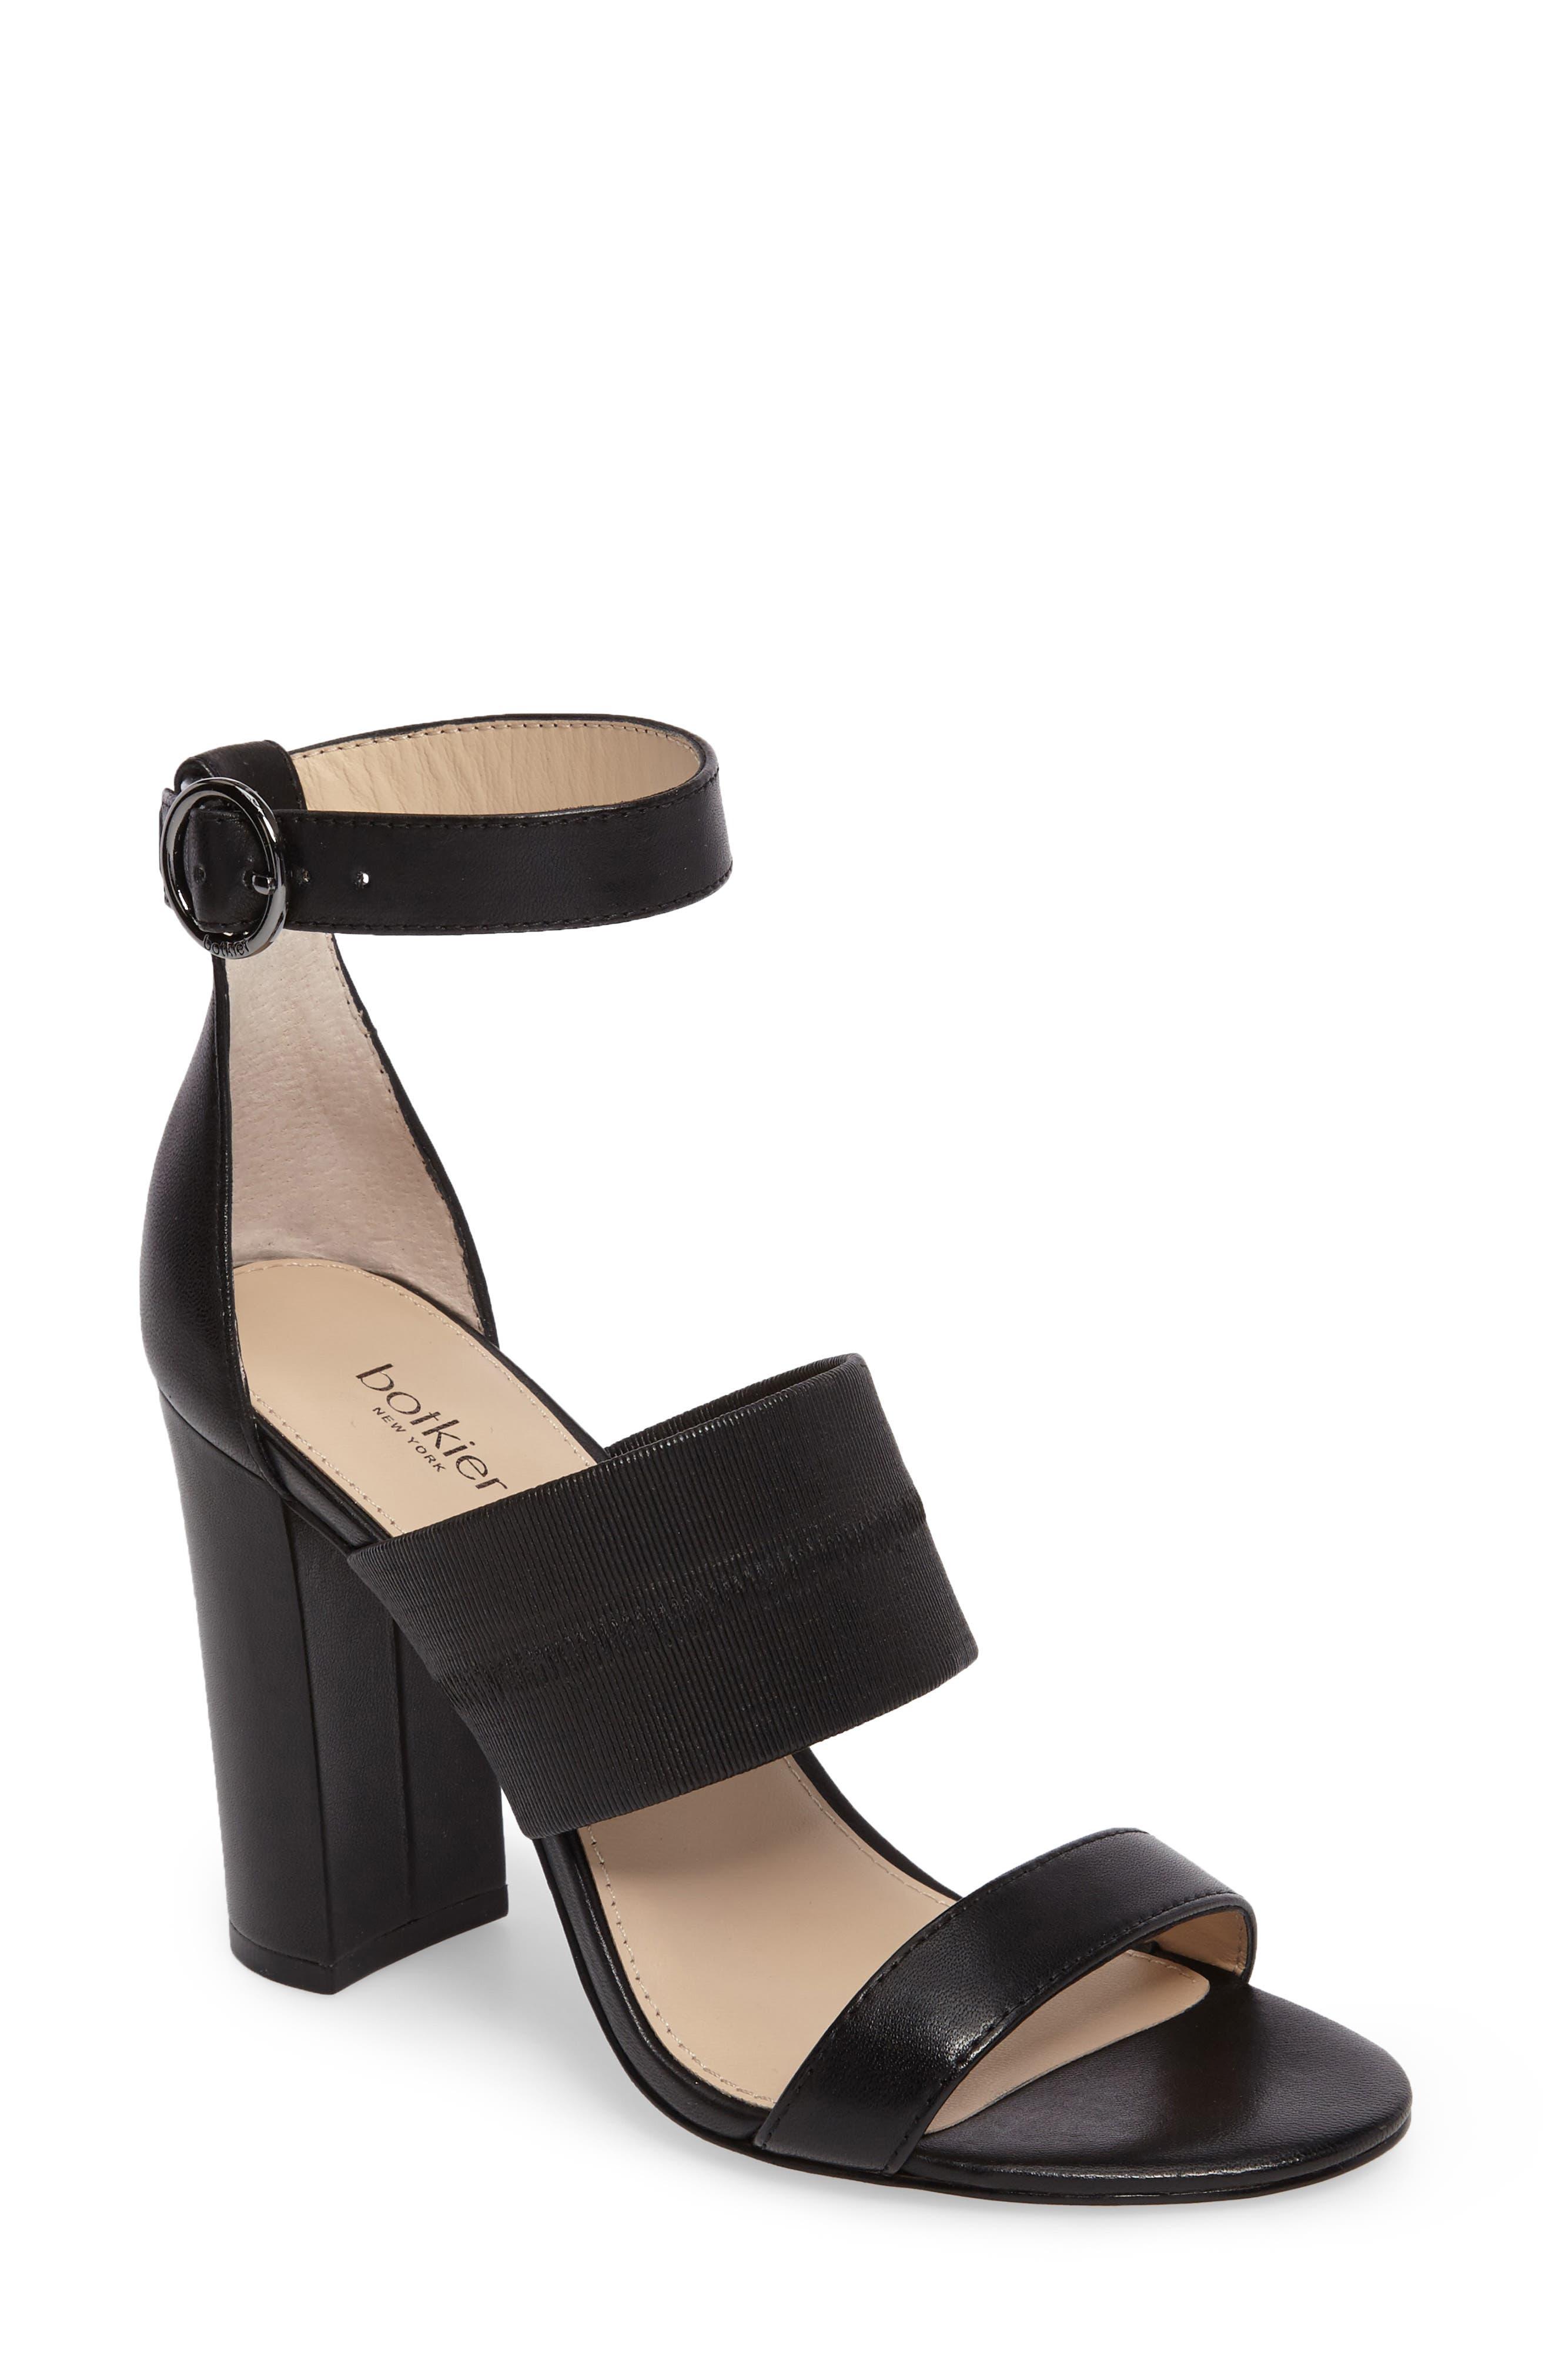 Gisella Ankle Strap Sandal,                         Main,                         color, 001